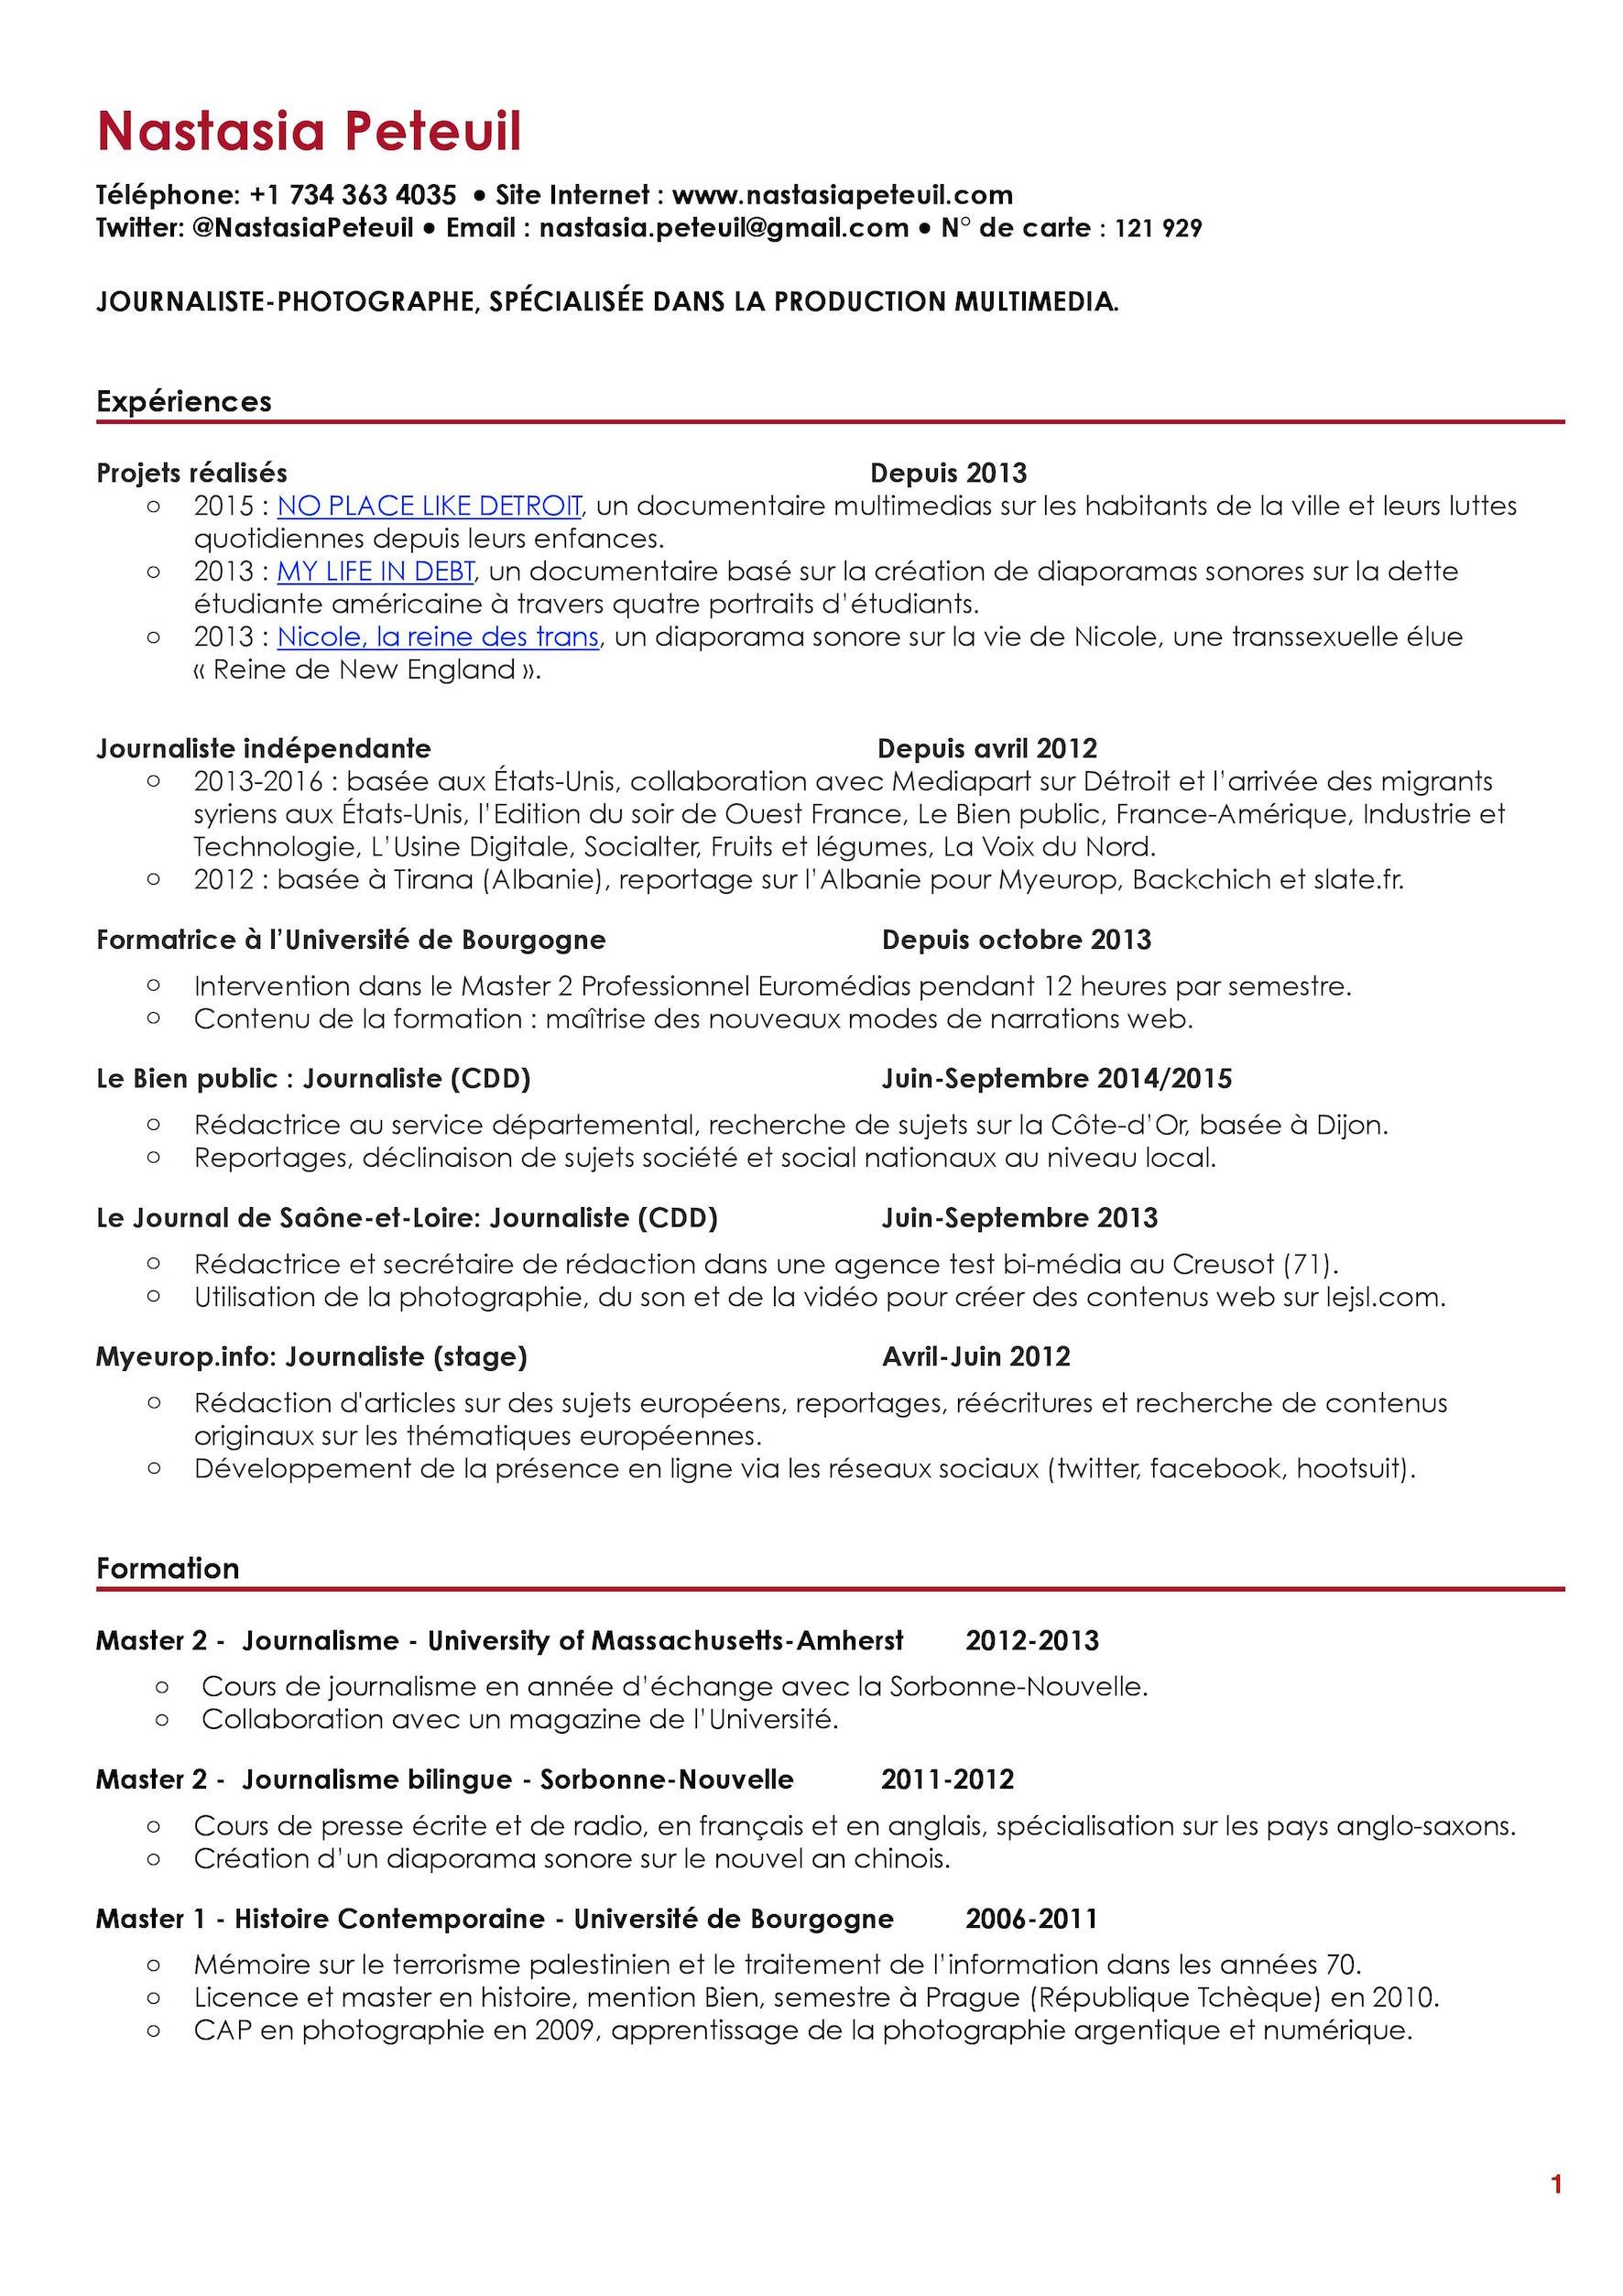 CV Nastasia Peteuil 2016-page-001